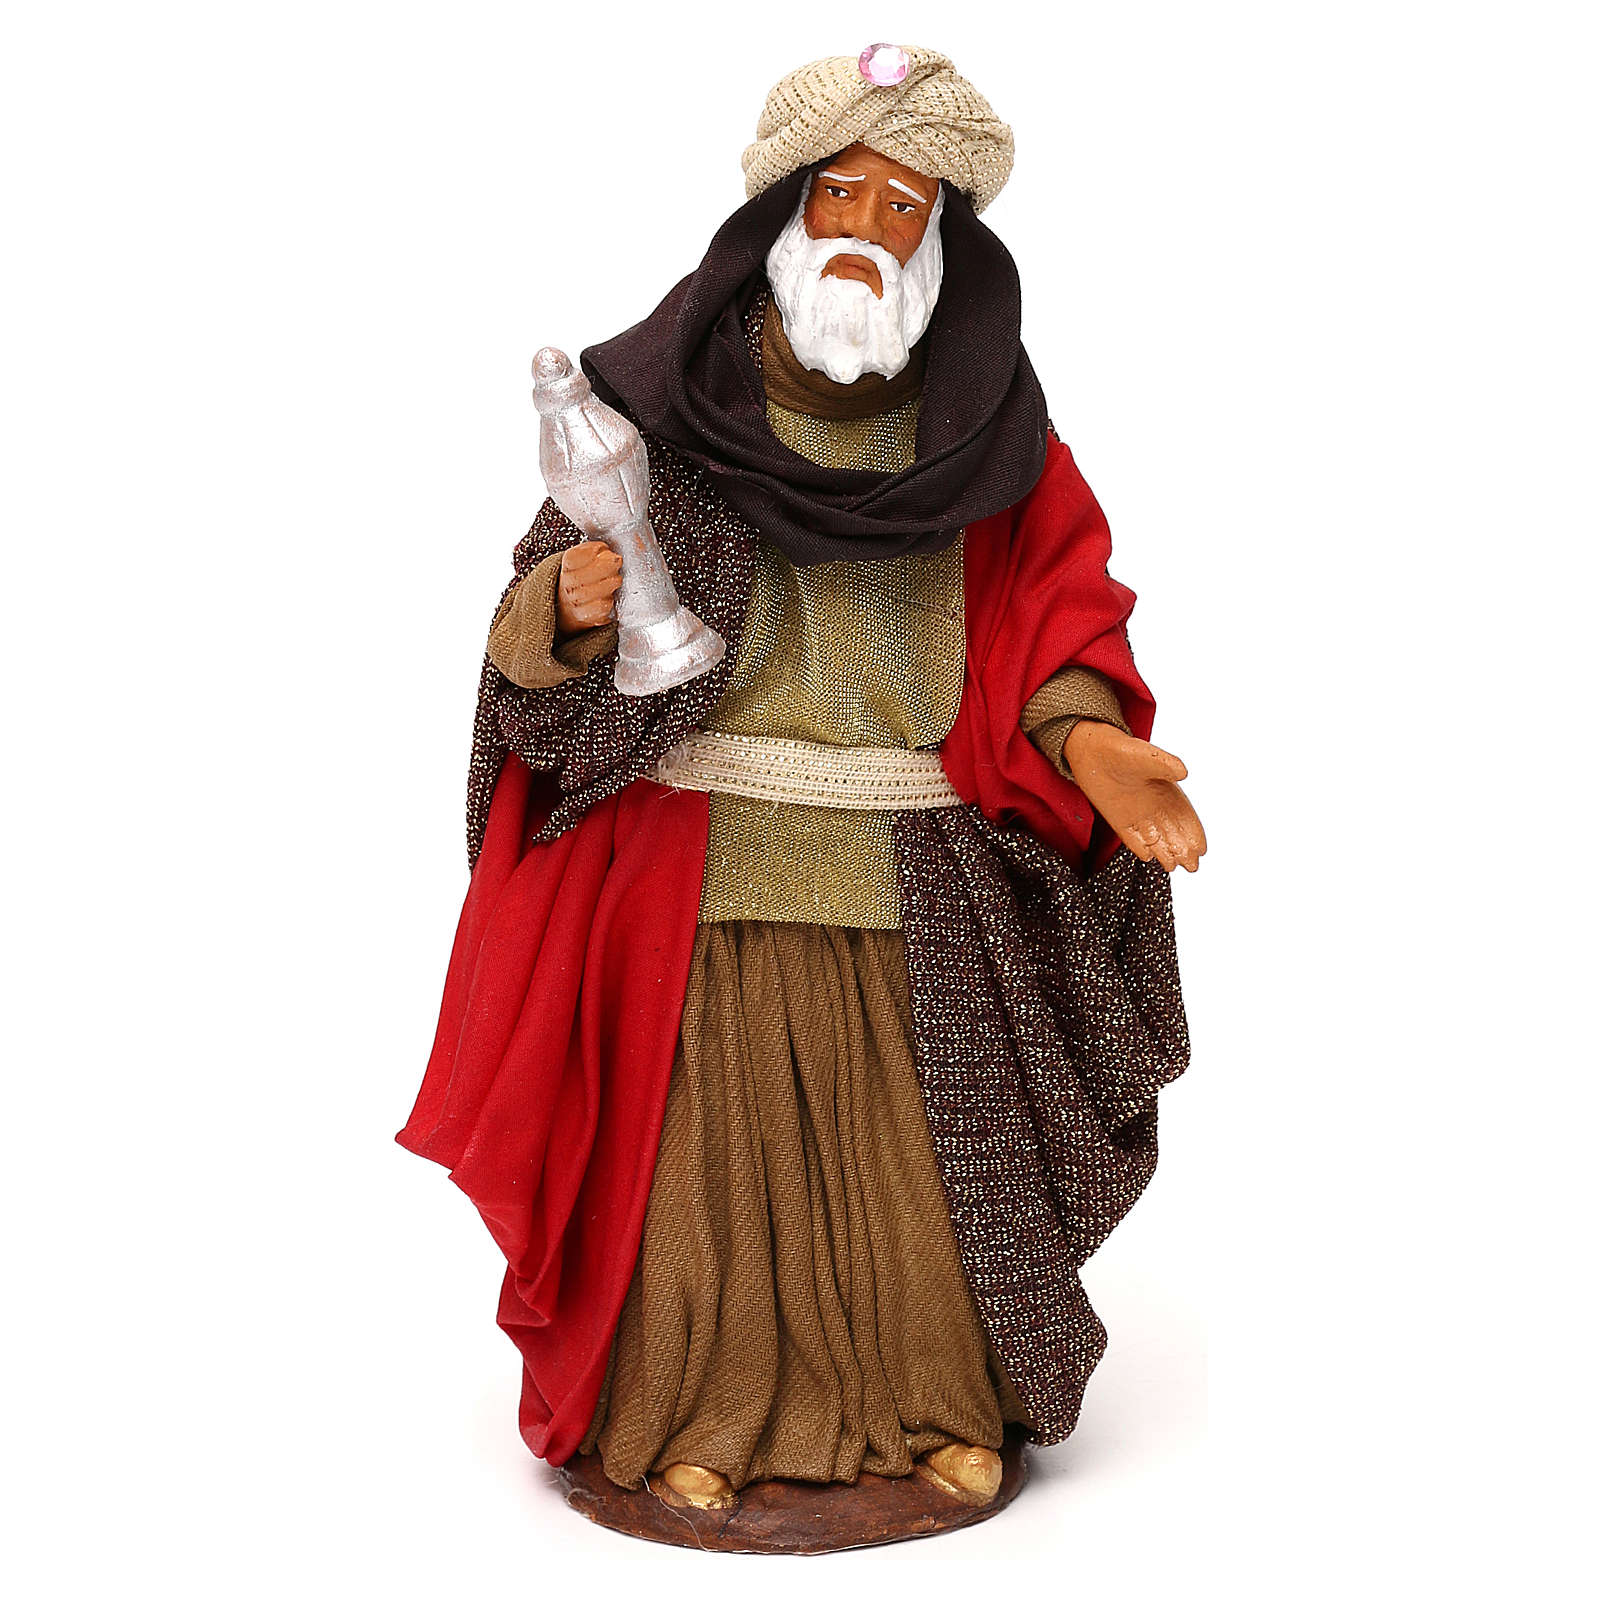 Nativity set accessories Three wise kings 14 cm figurines 4